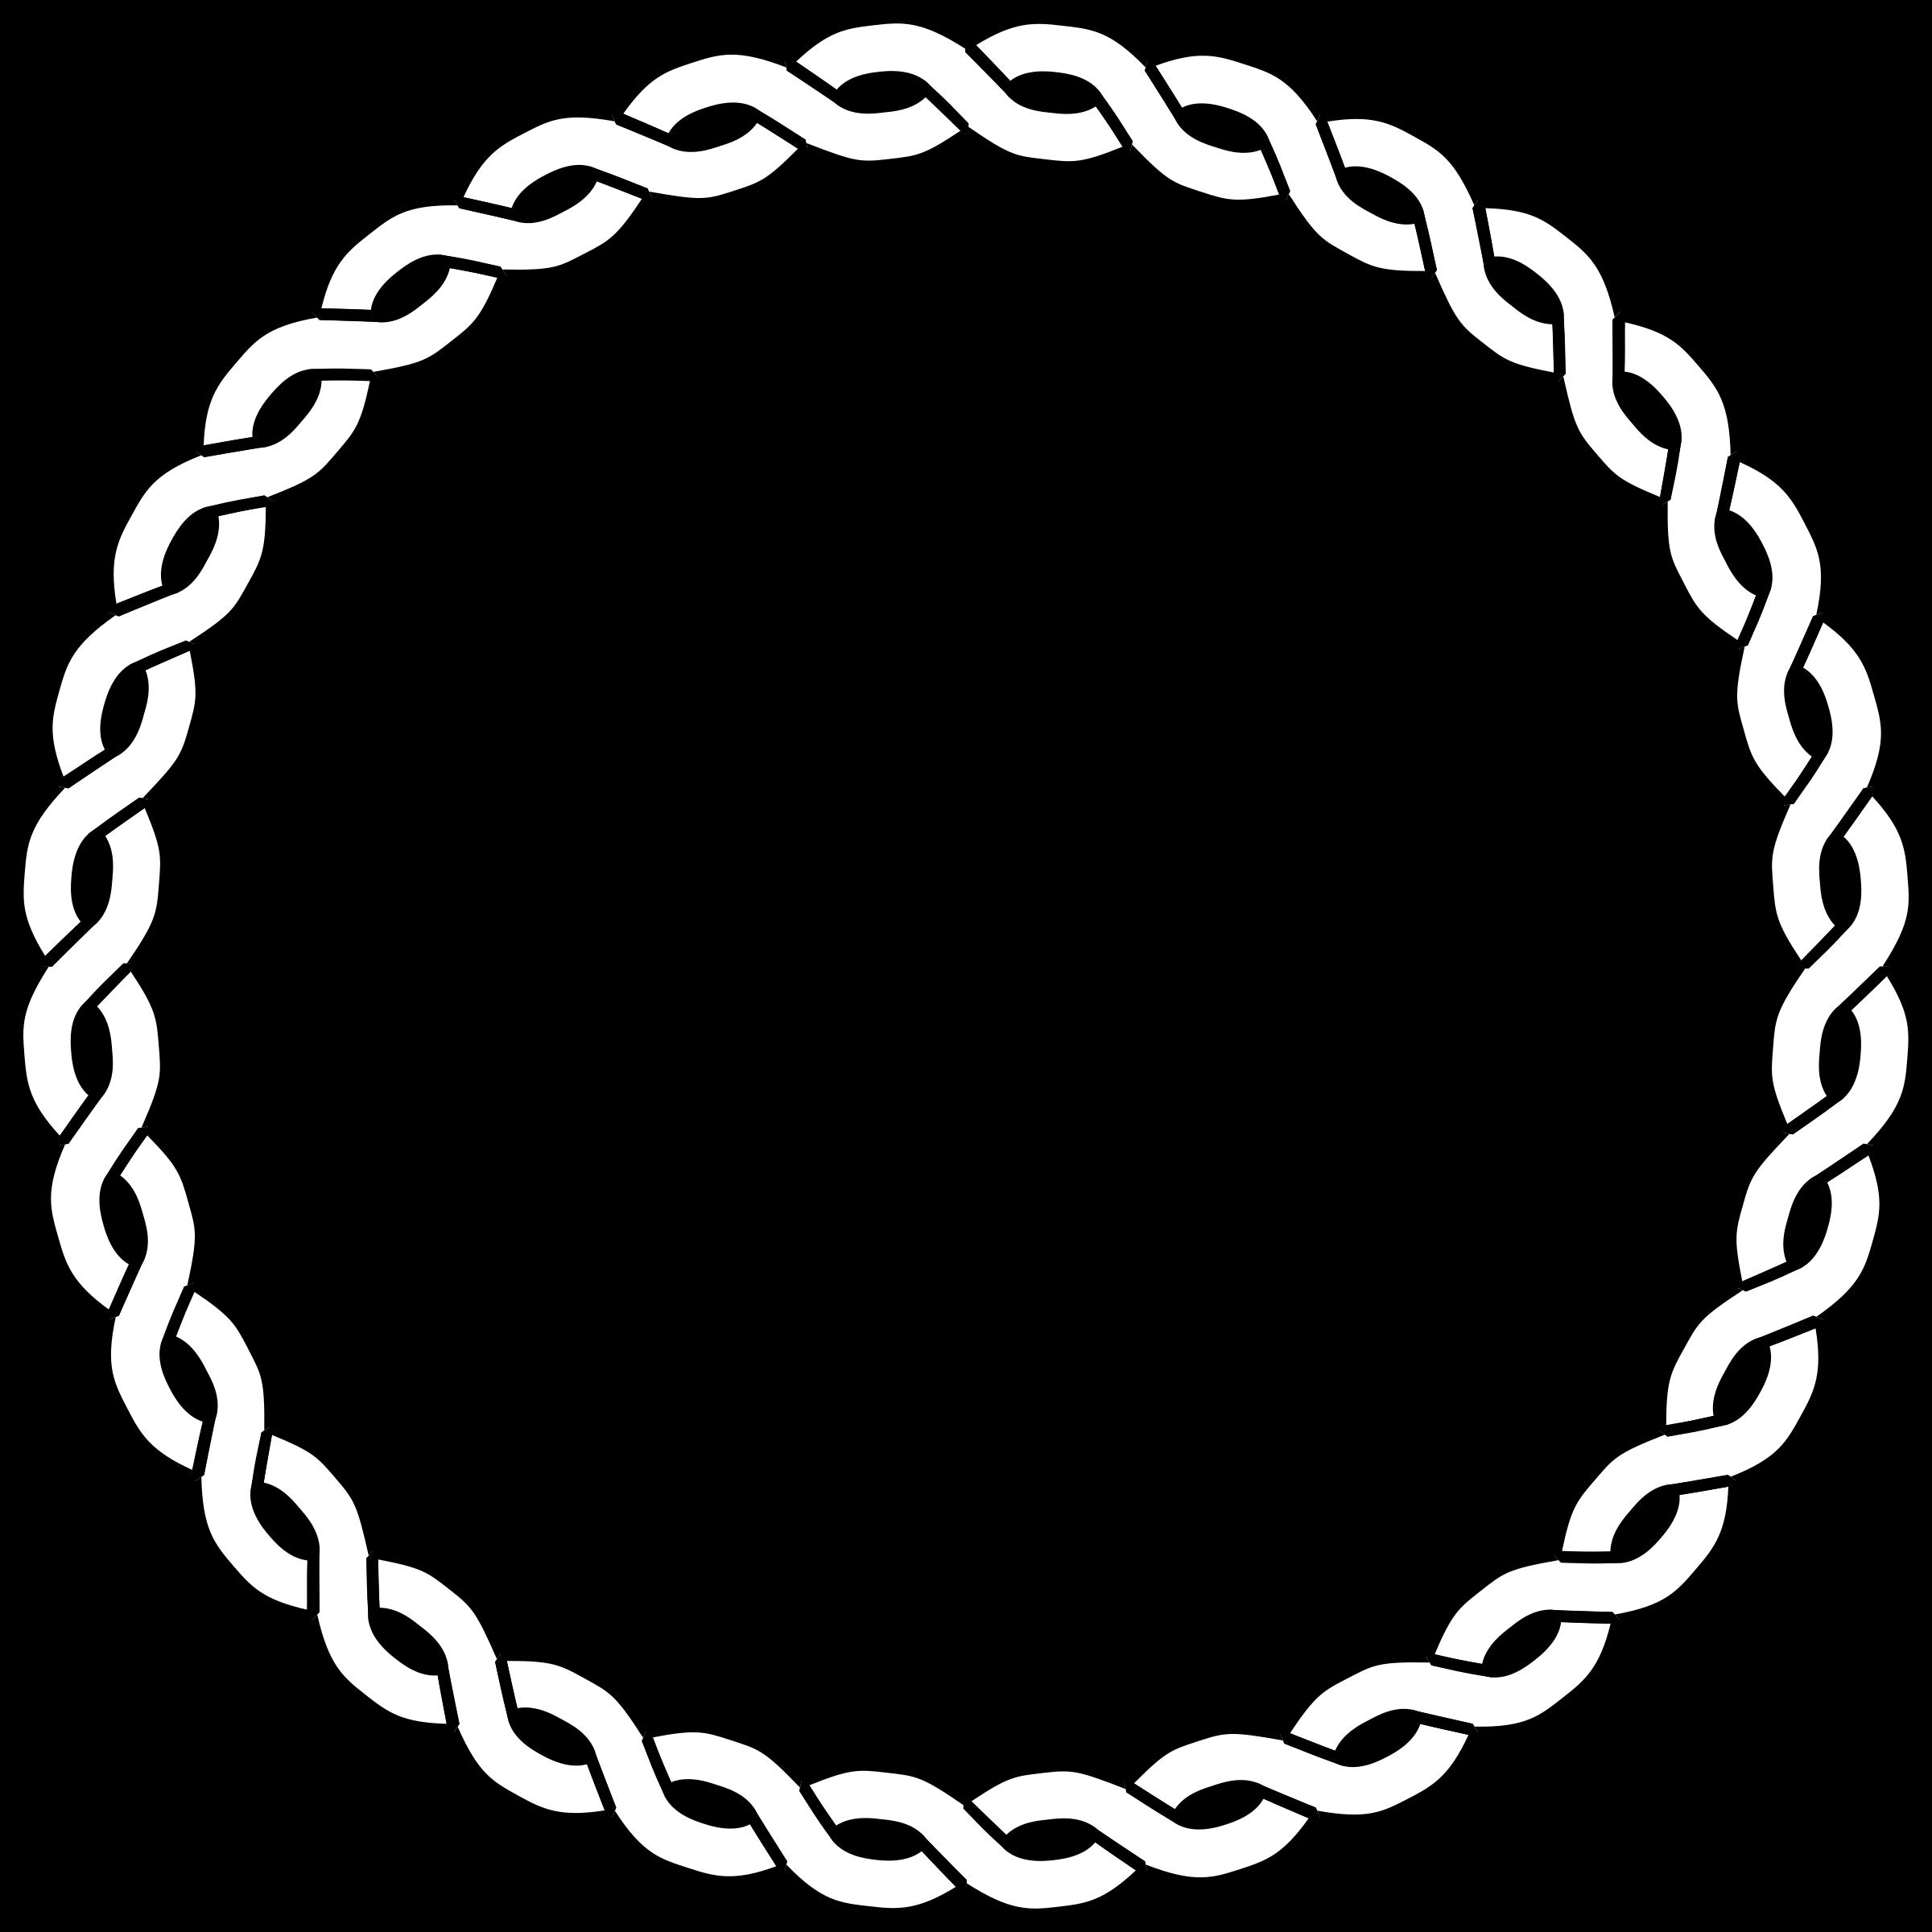 vector transparent library Drawing rope nautical. Clipart border circle big